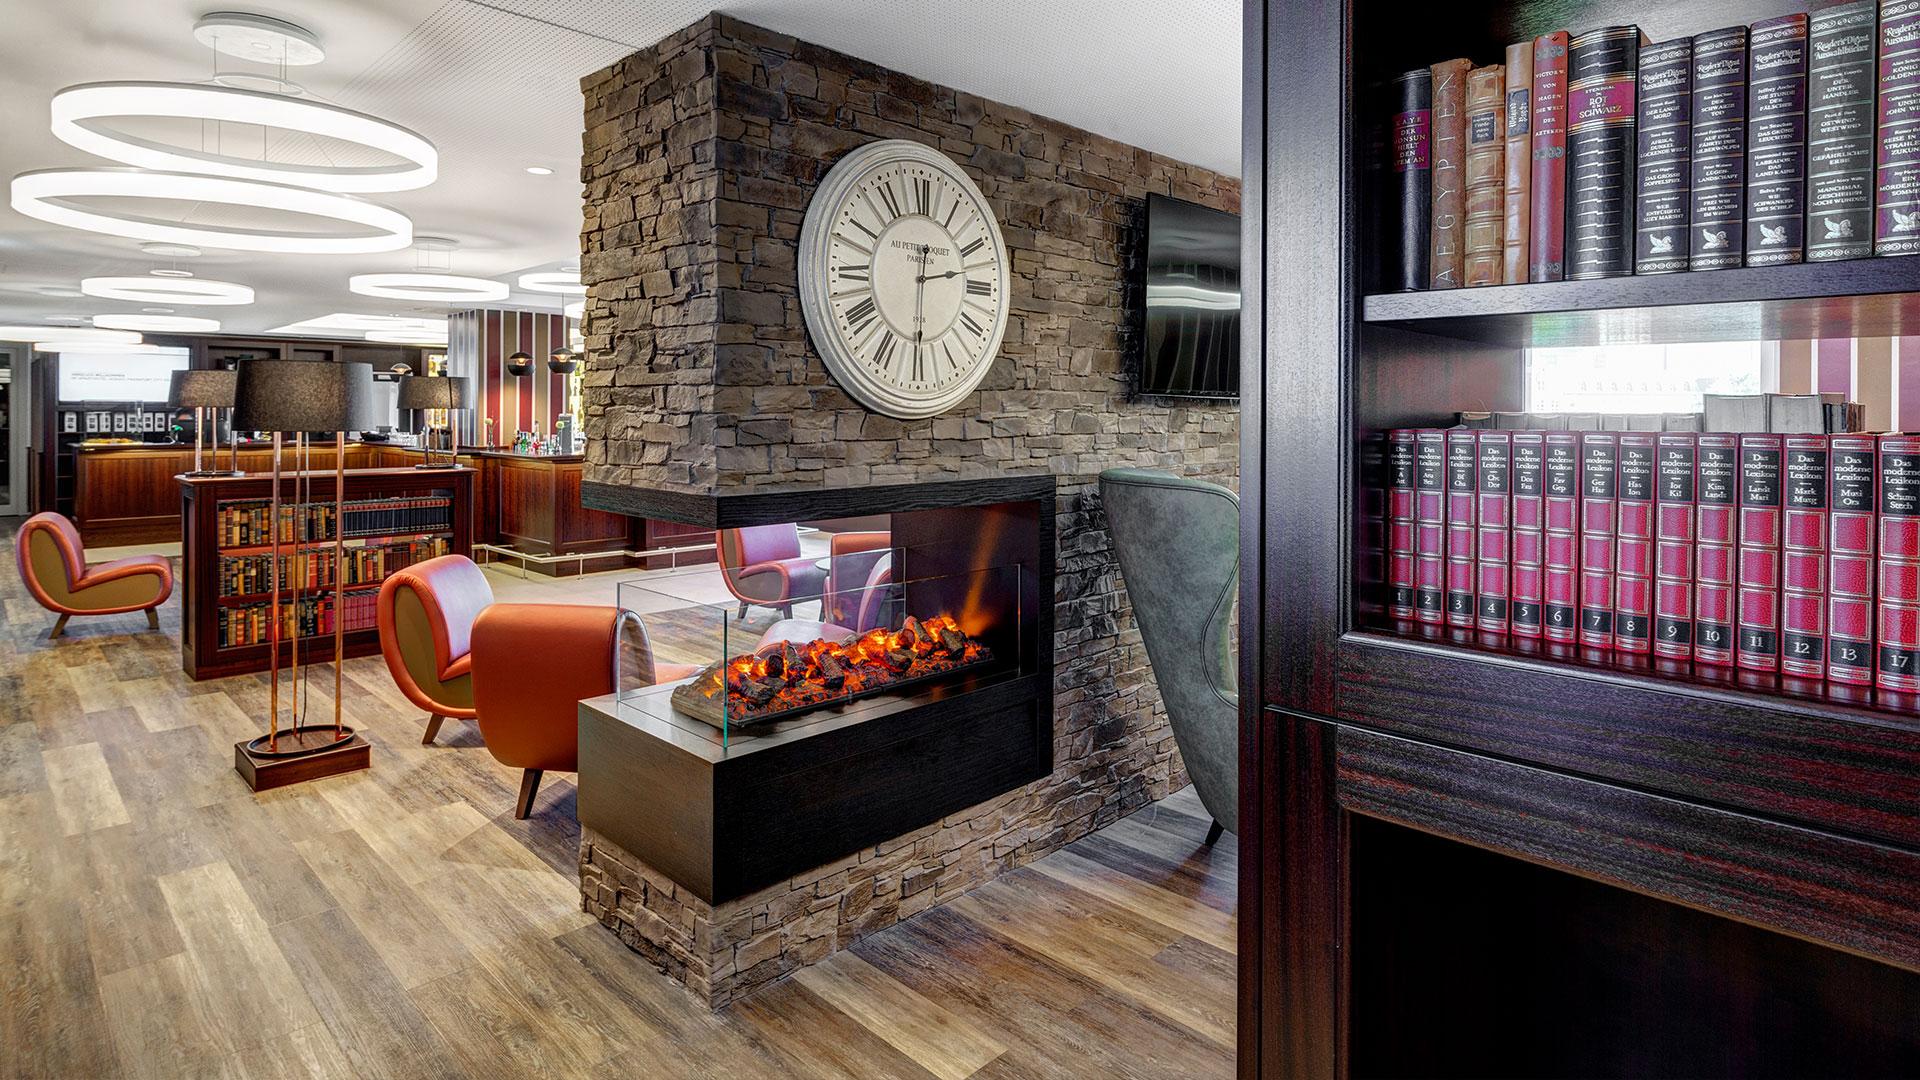 Lounge - 04 - Aparthotel Frankfurt City ~ Success Hotel Group